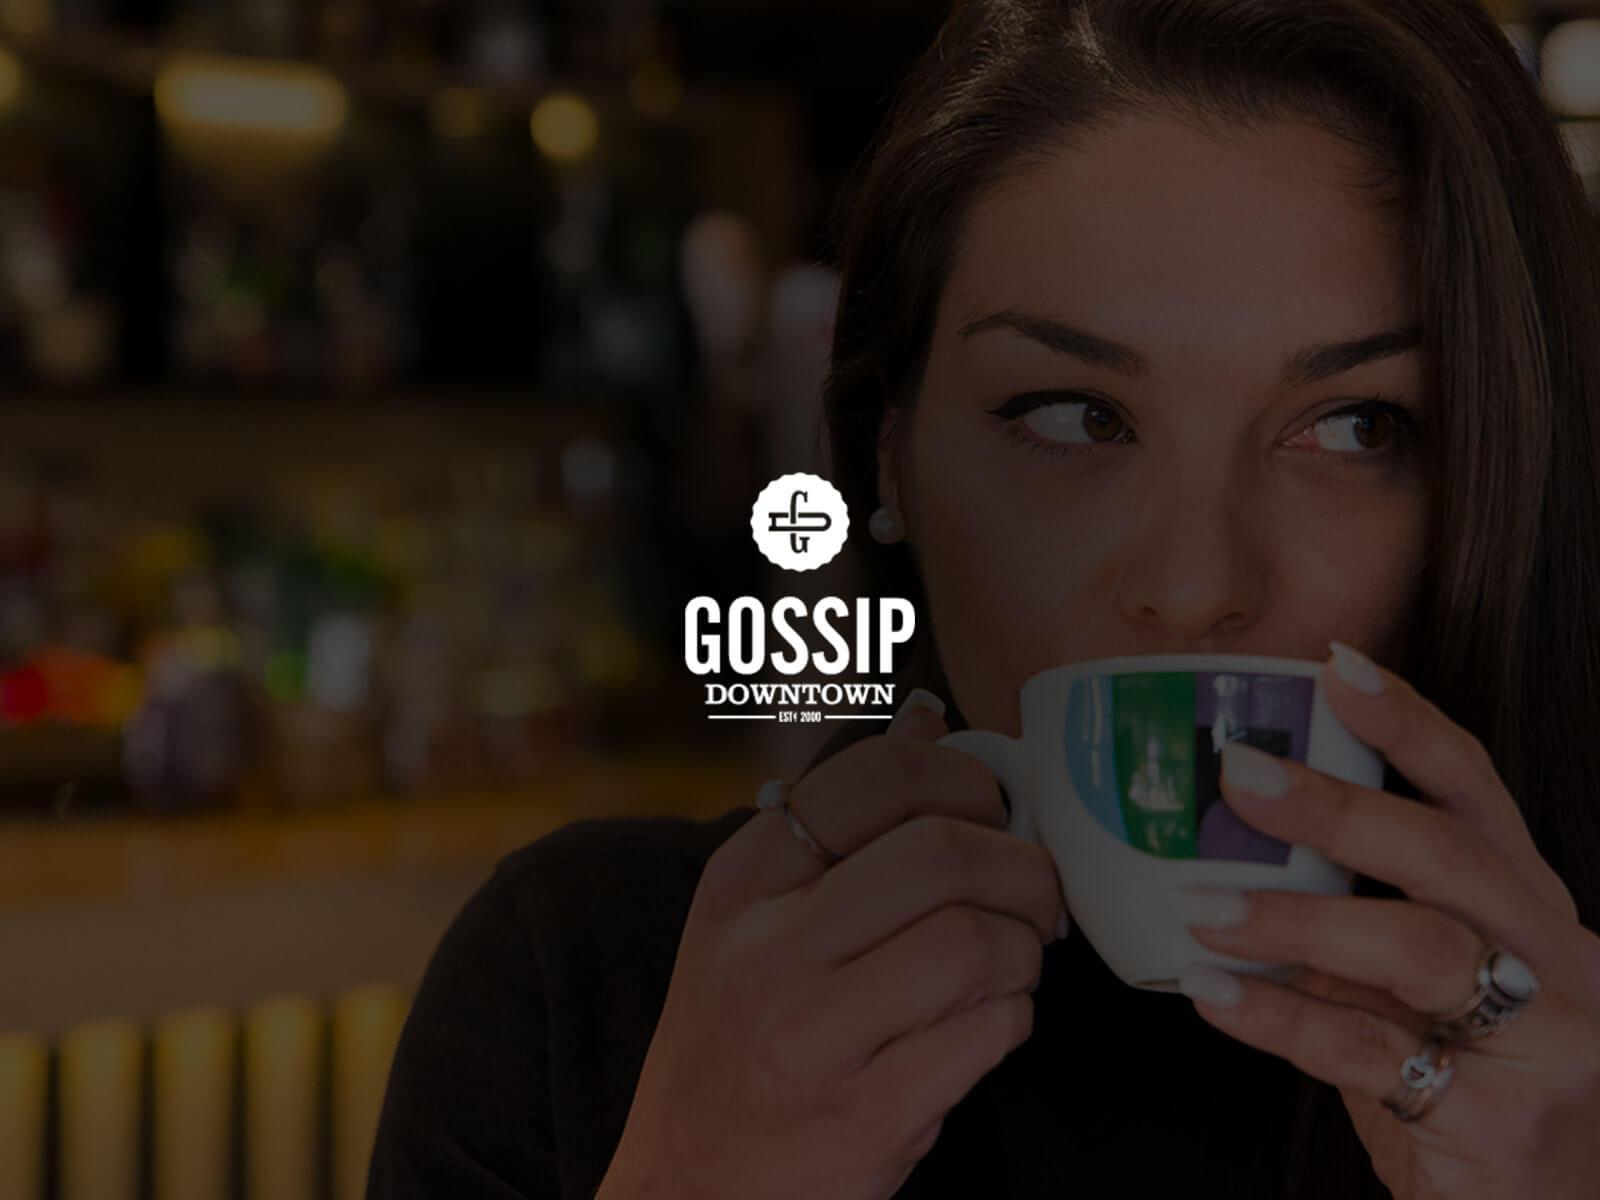 Gossip Downtown